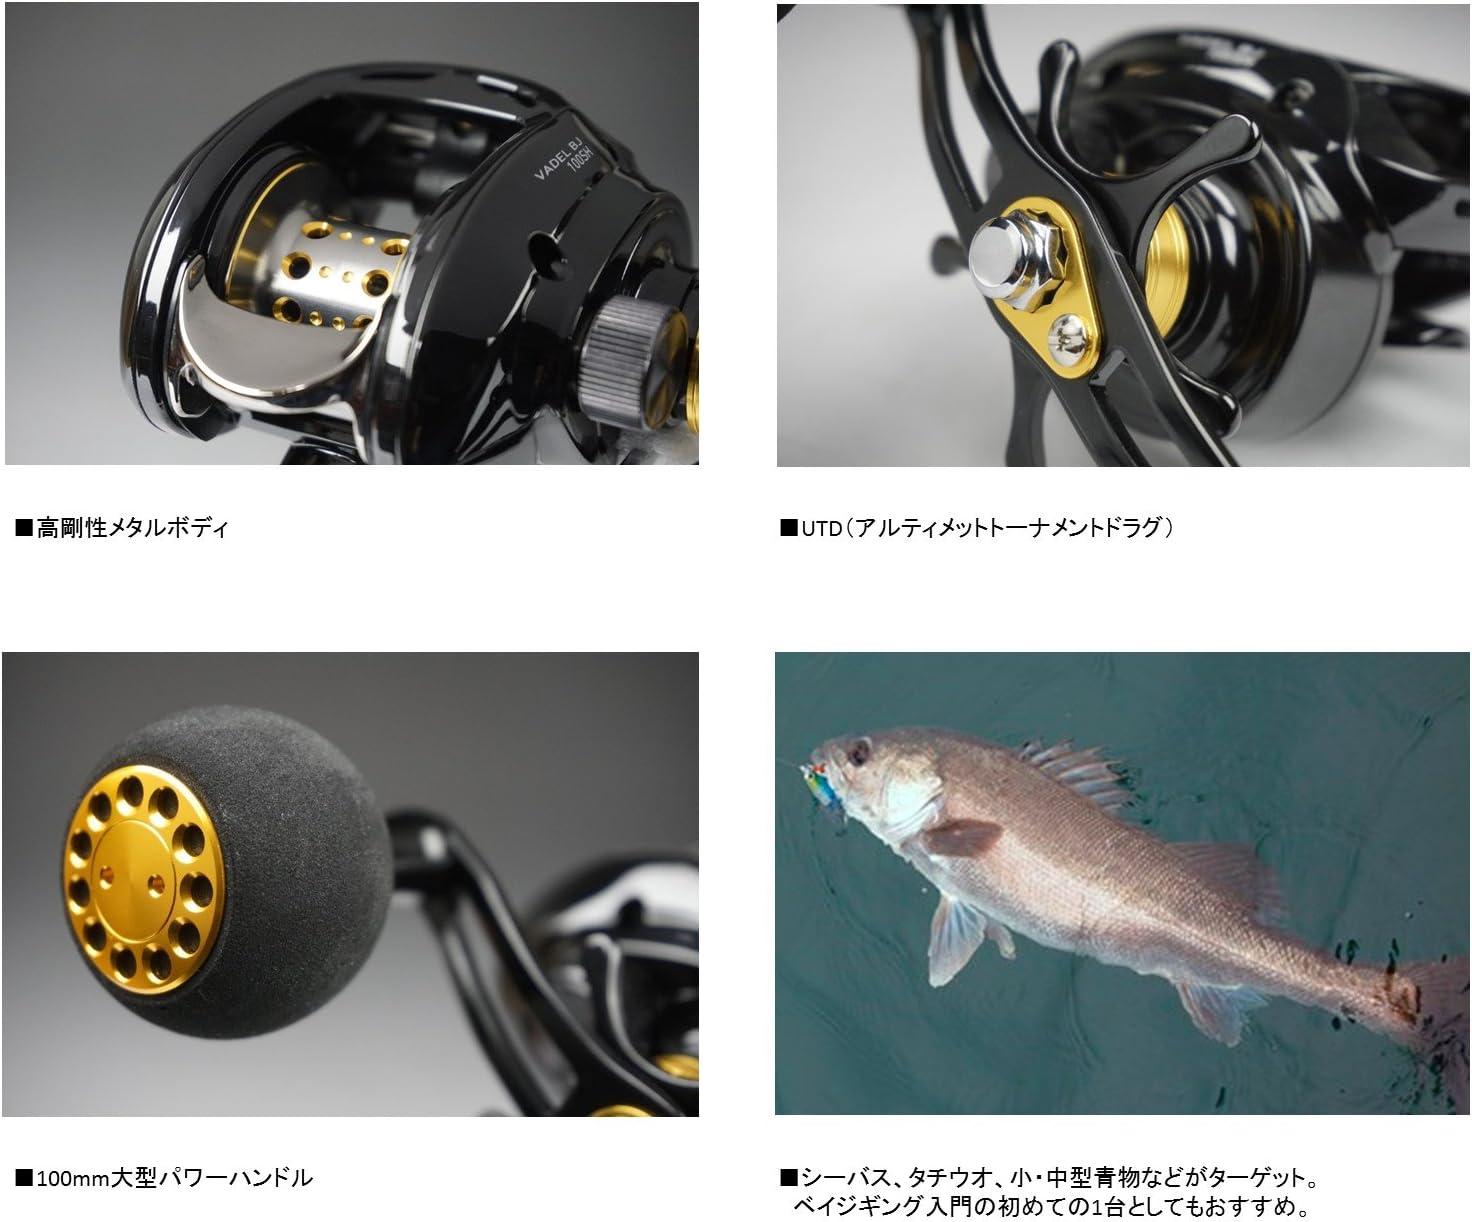 Baitcasting Reel From Japan Daiwa Vadel BJ 100 SHL Left handle